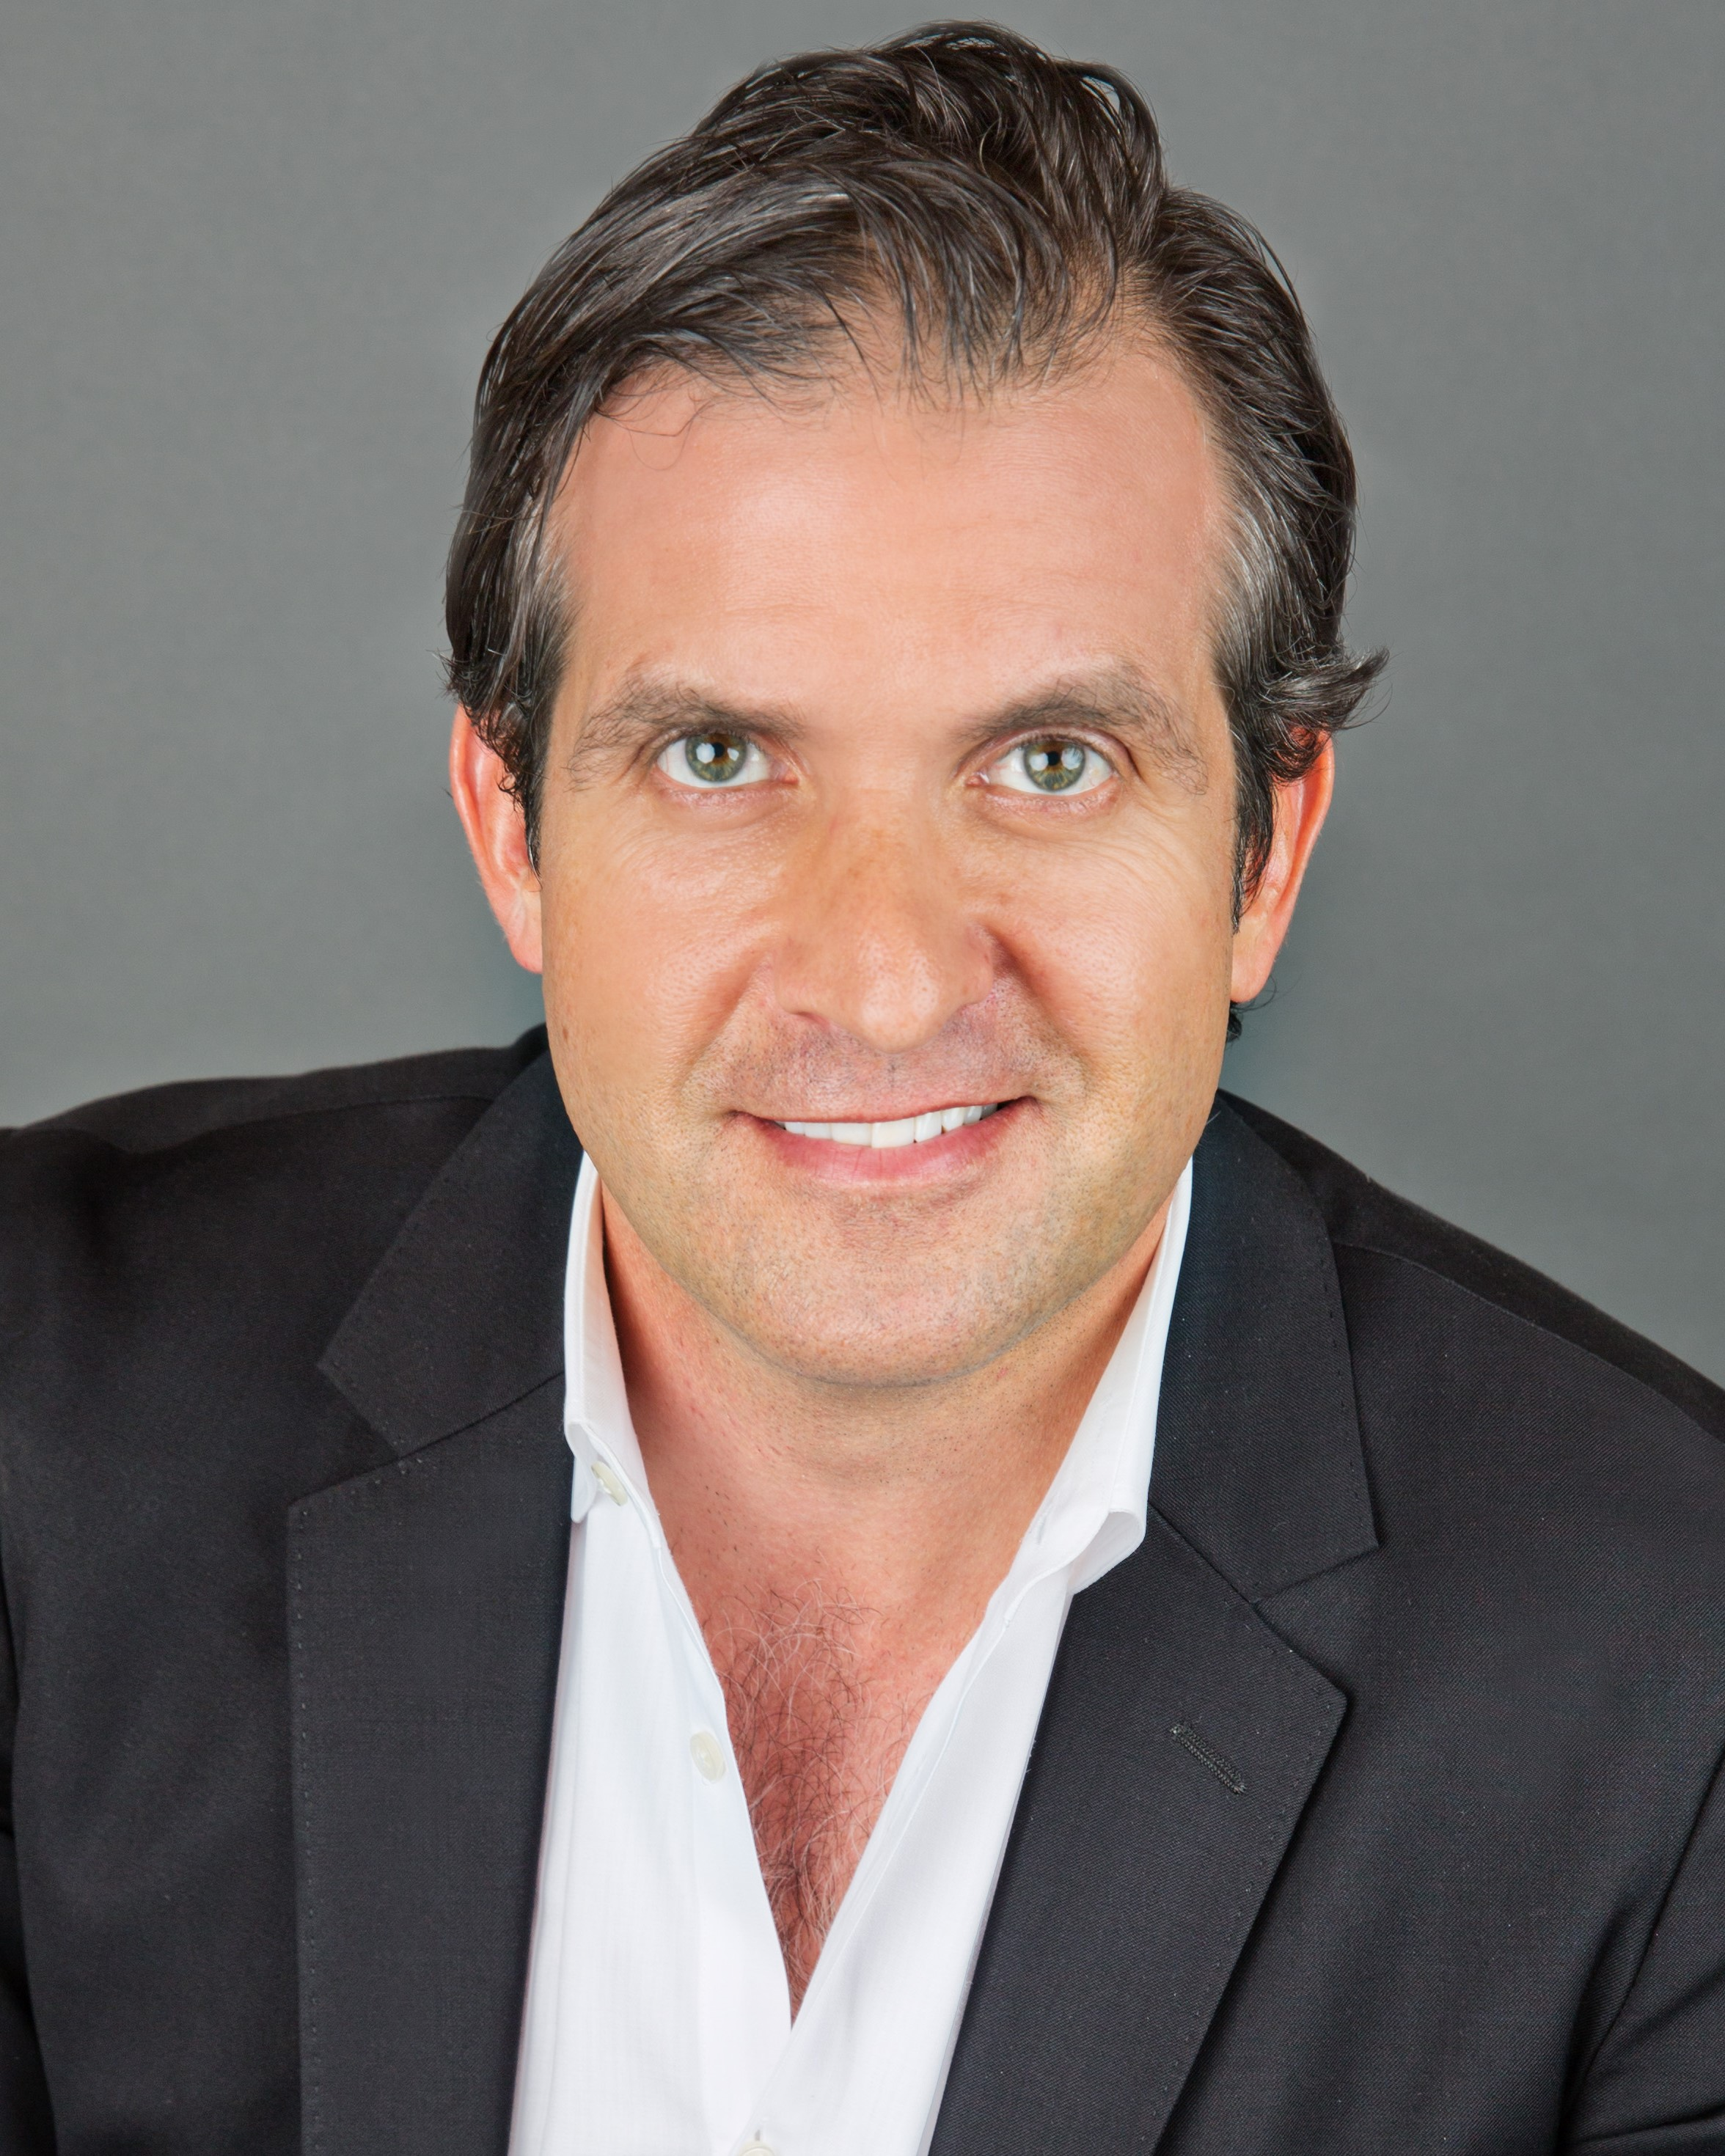 Chad Goldwasser, Broker, Realtor, Pure Gold Realty, Austin, Texas